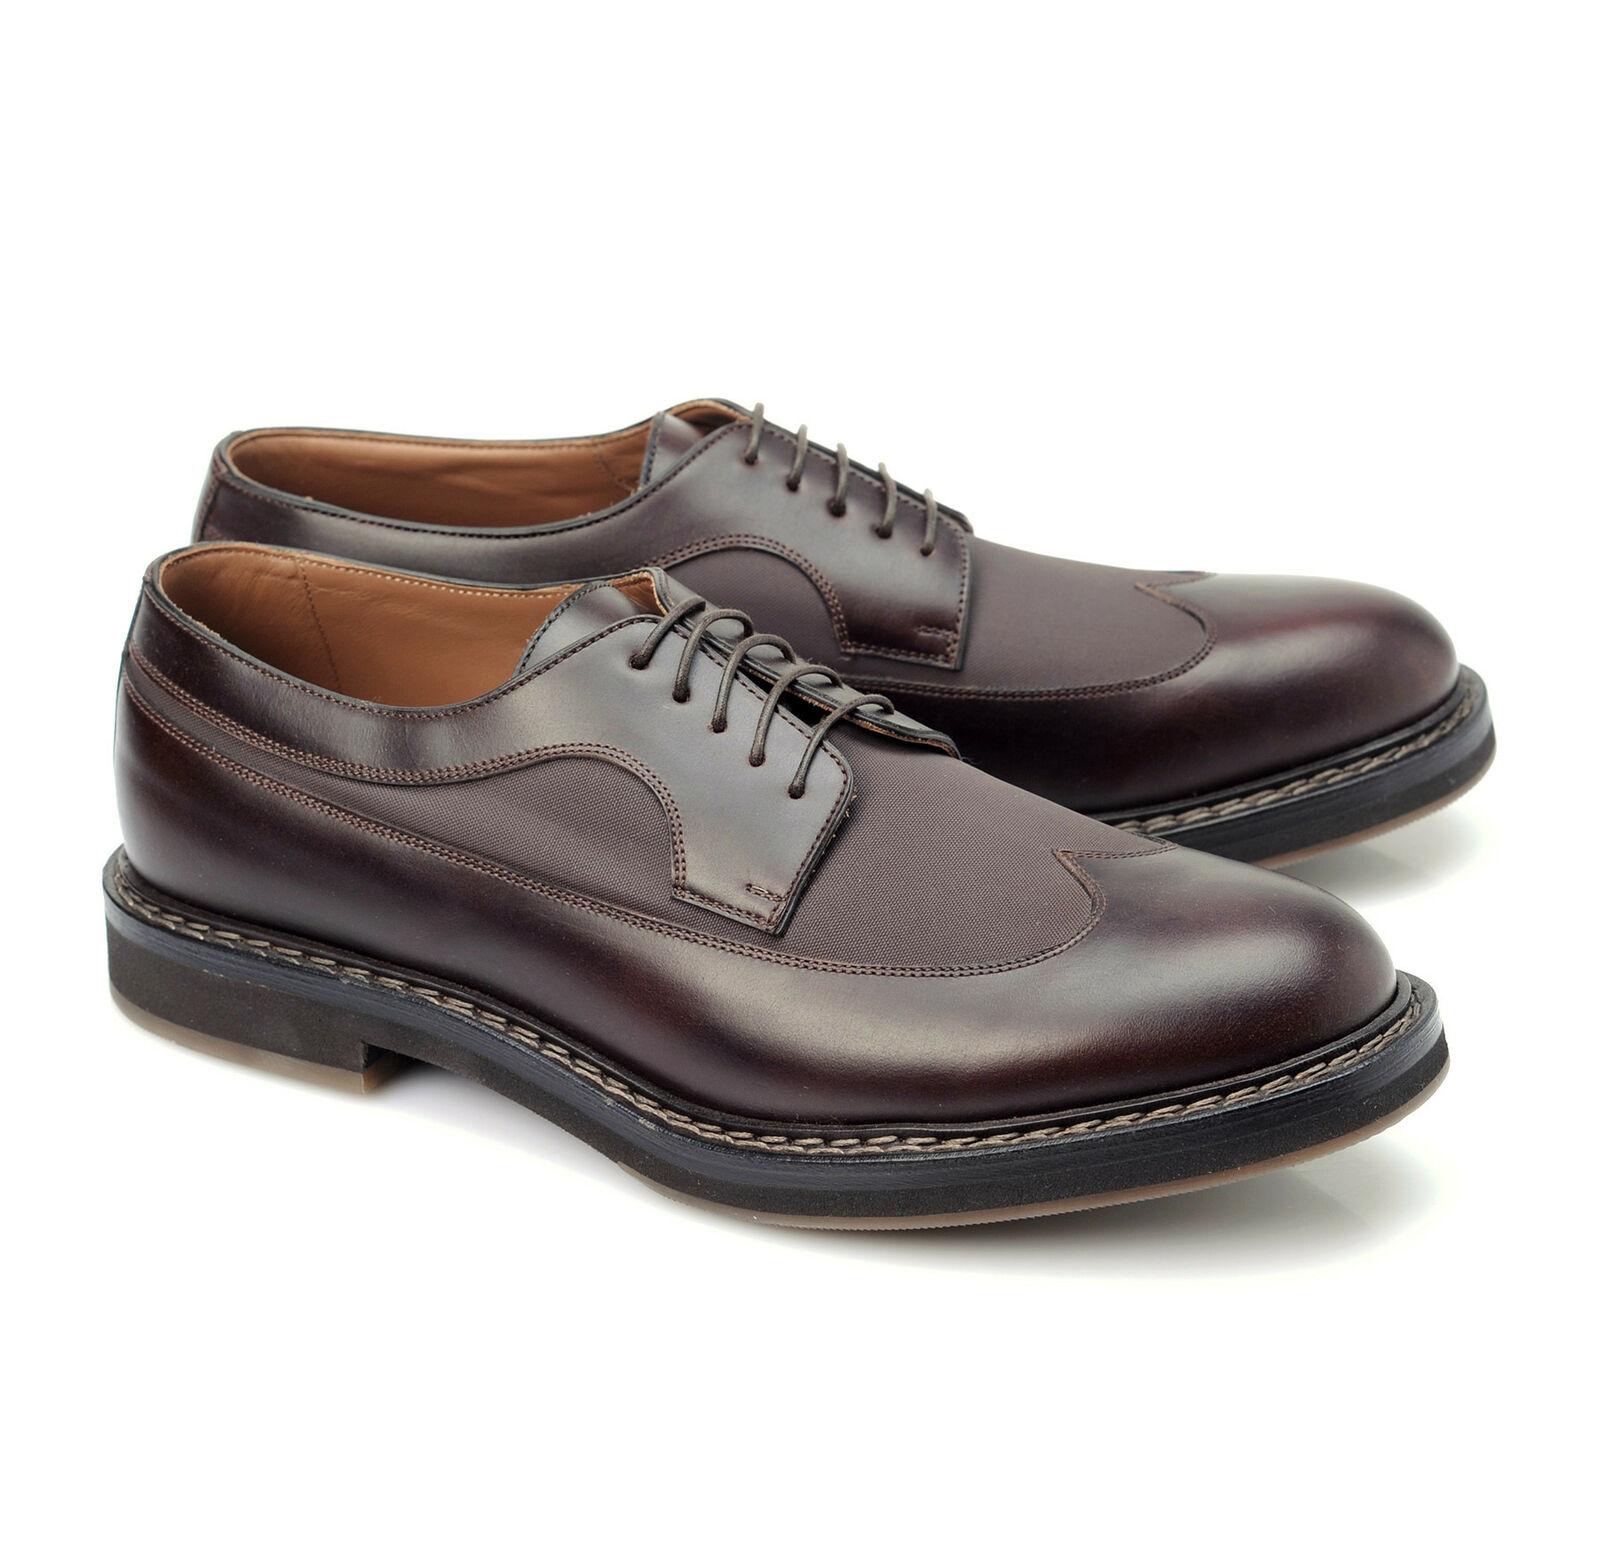 Bcourirello Cucinelli Homme 100% Cuir Marron Bout D'Aile   Chaussure US 12 EU 45